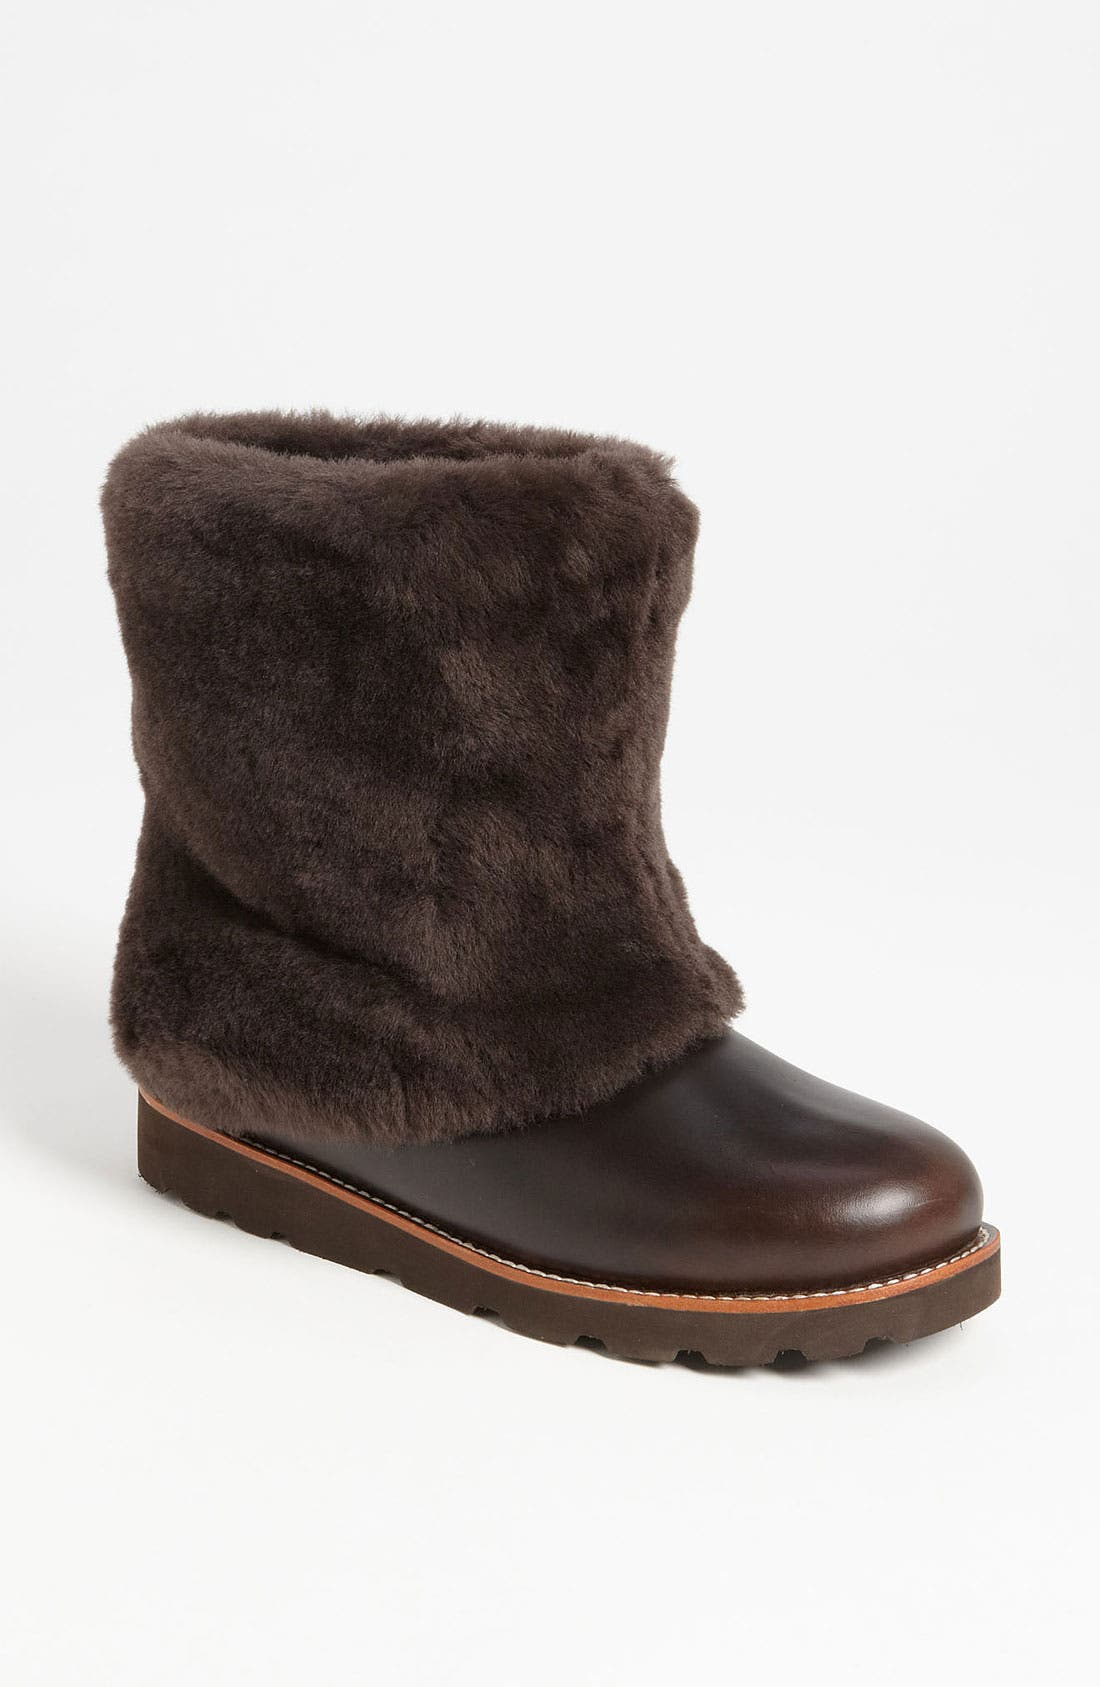 Main Image - UGG® Australia 'Maylin' Boot (Women)